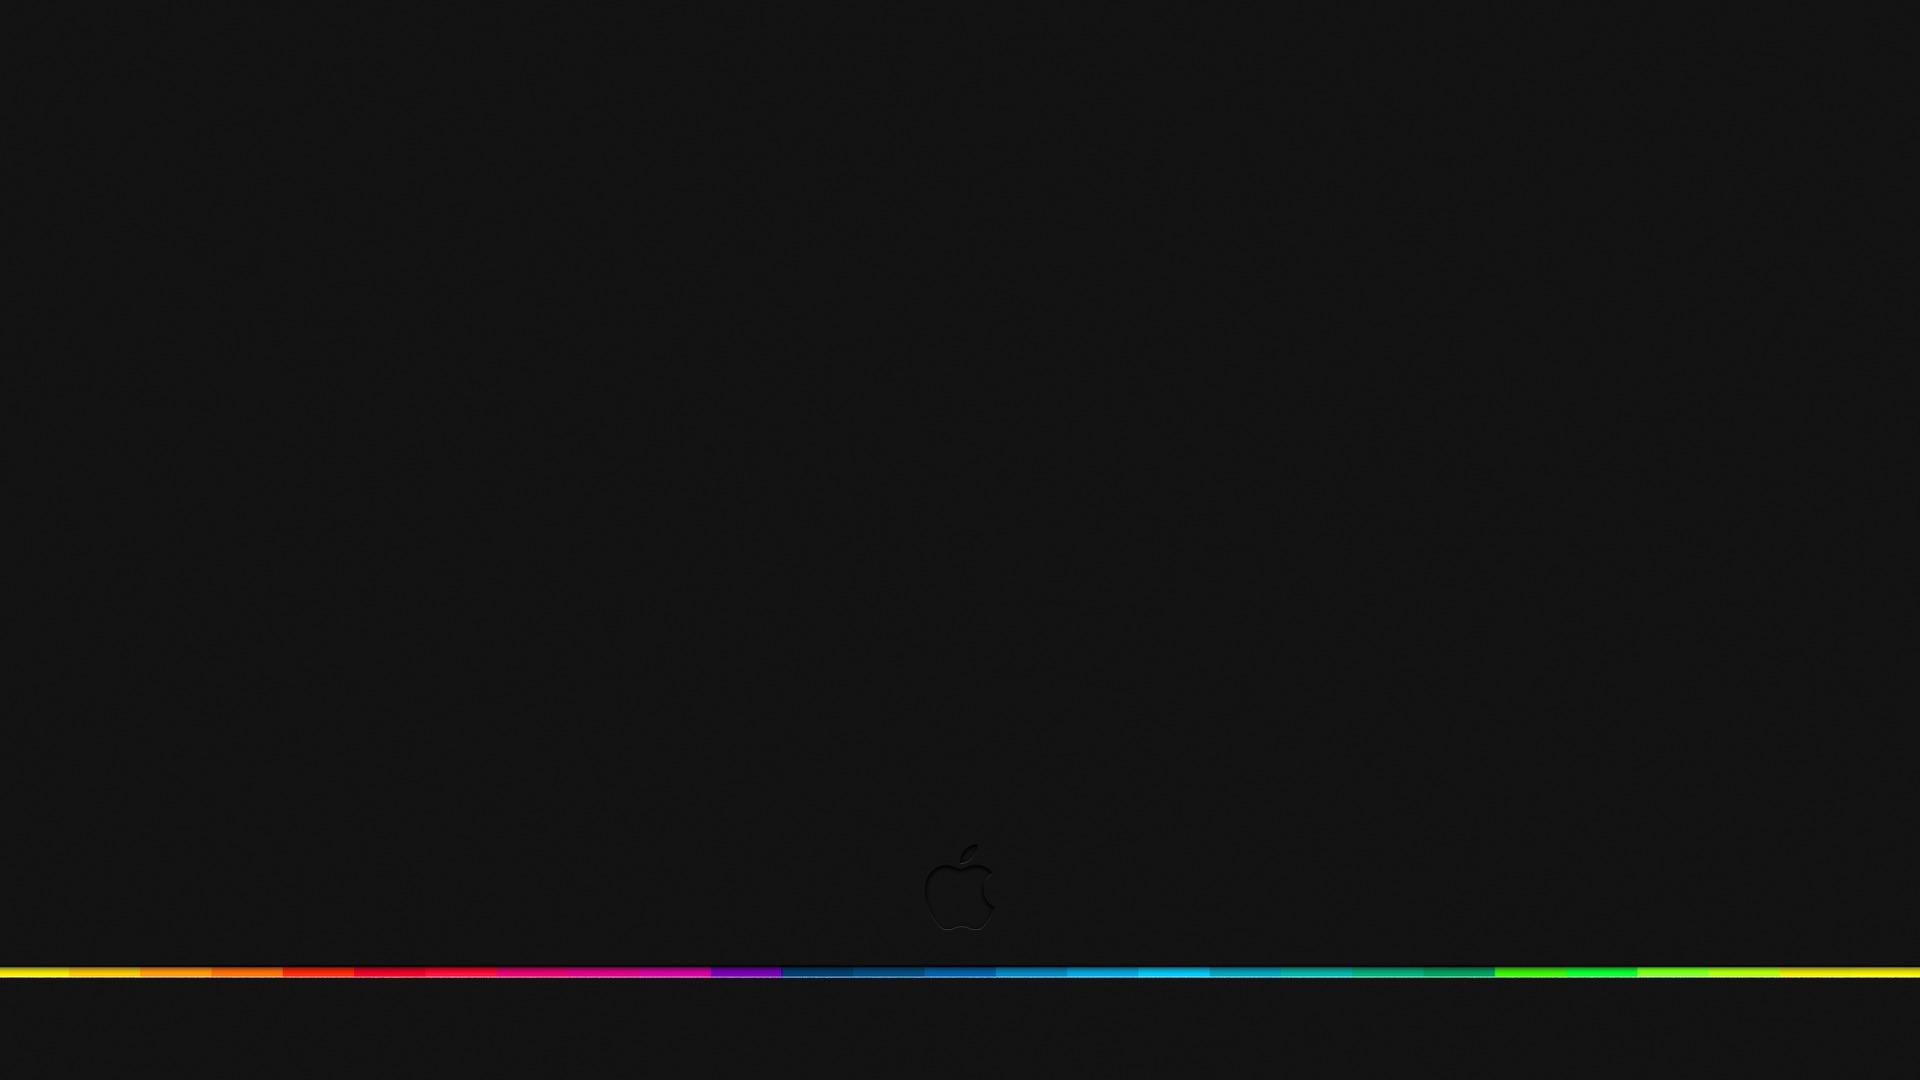 Dark Wallpaper 1920×1080 | PixelsTalk Net